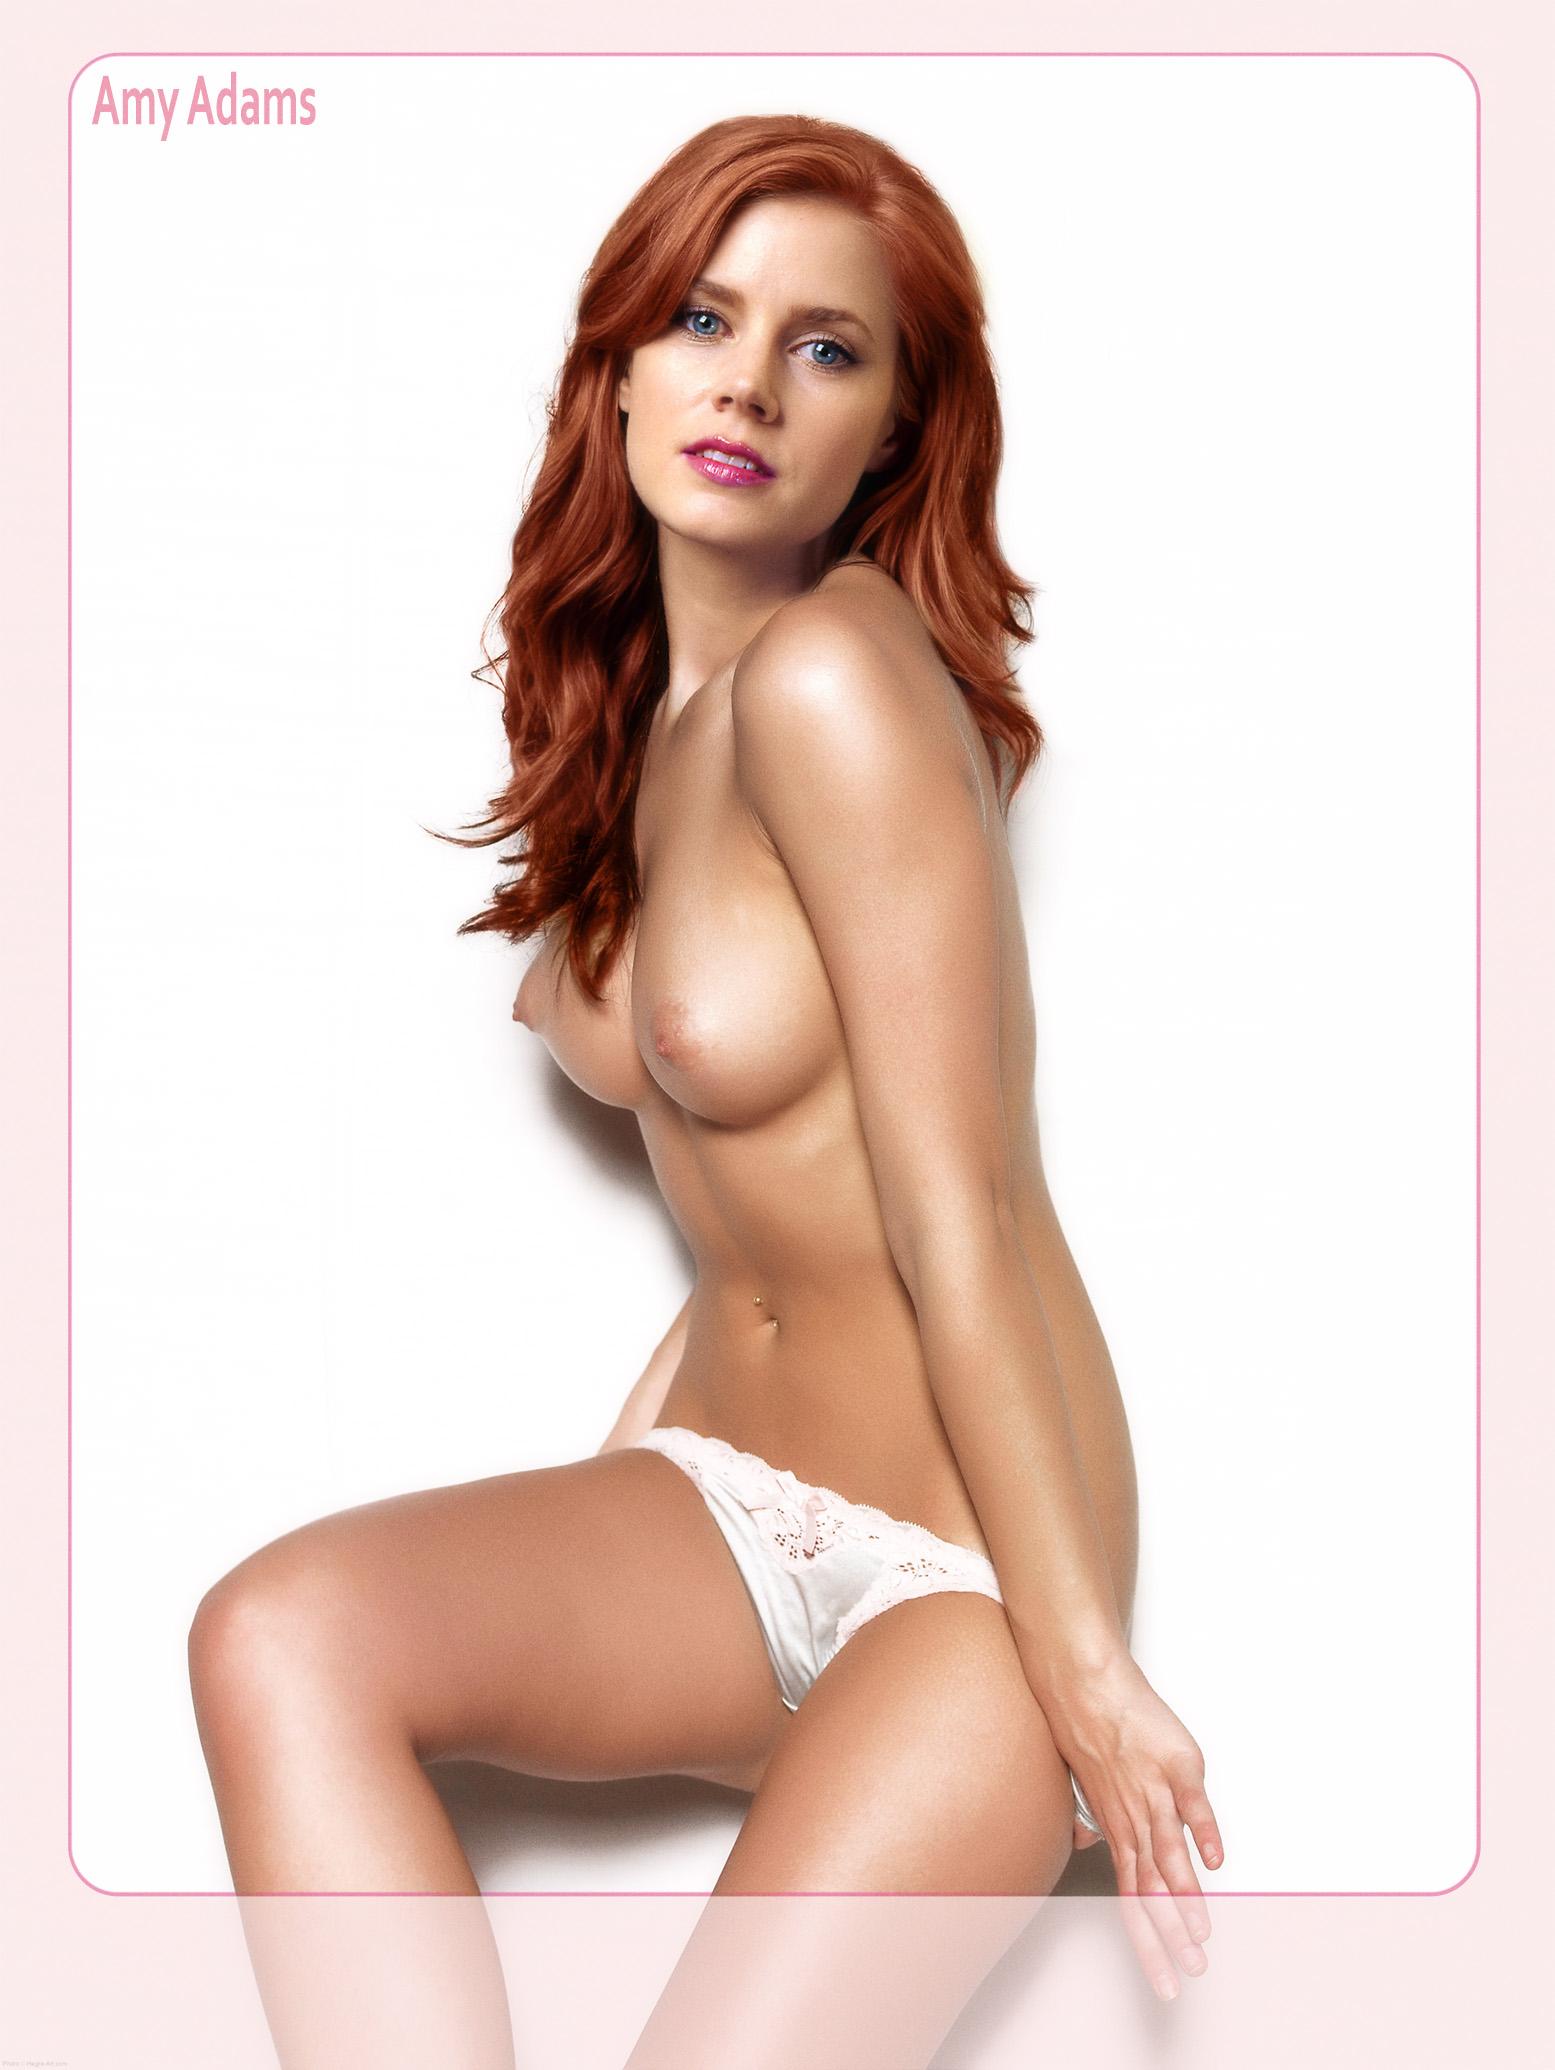 Warm Amy Adams Nude Photo Pic